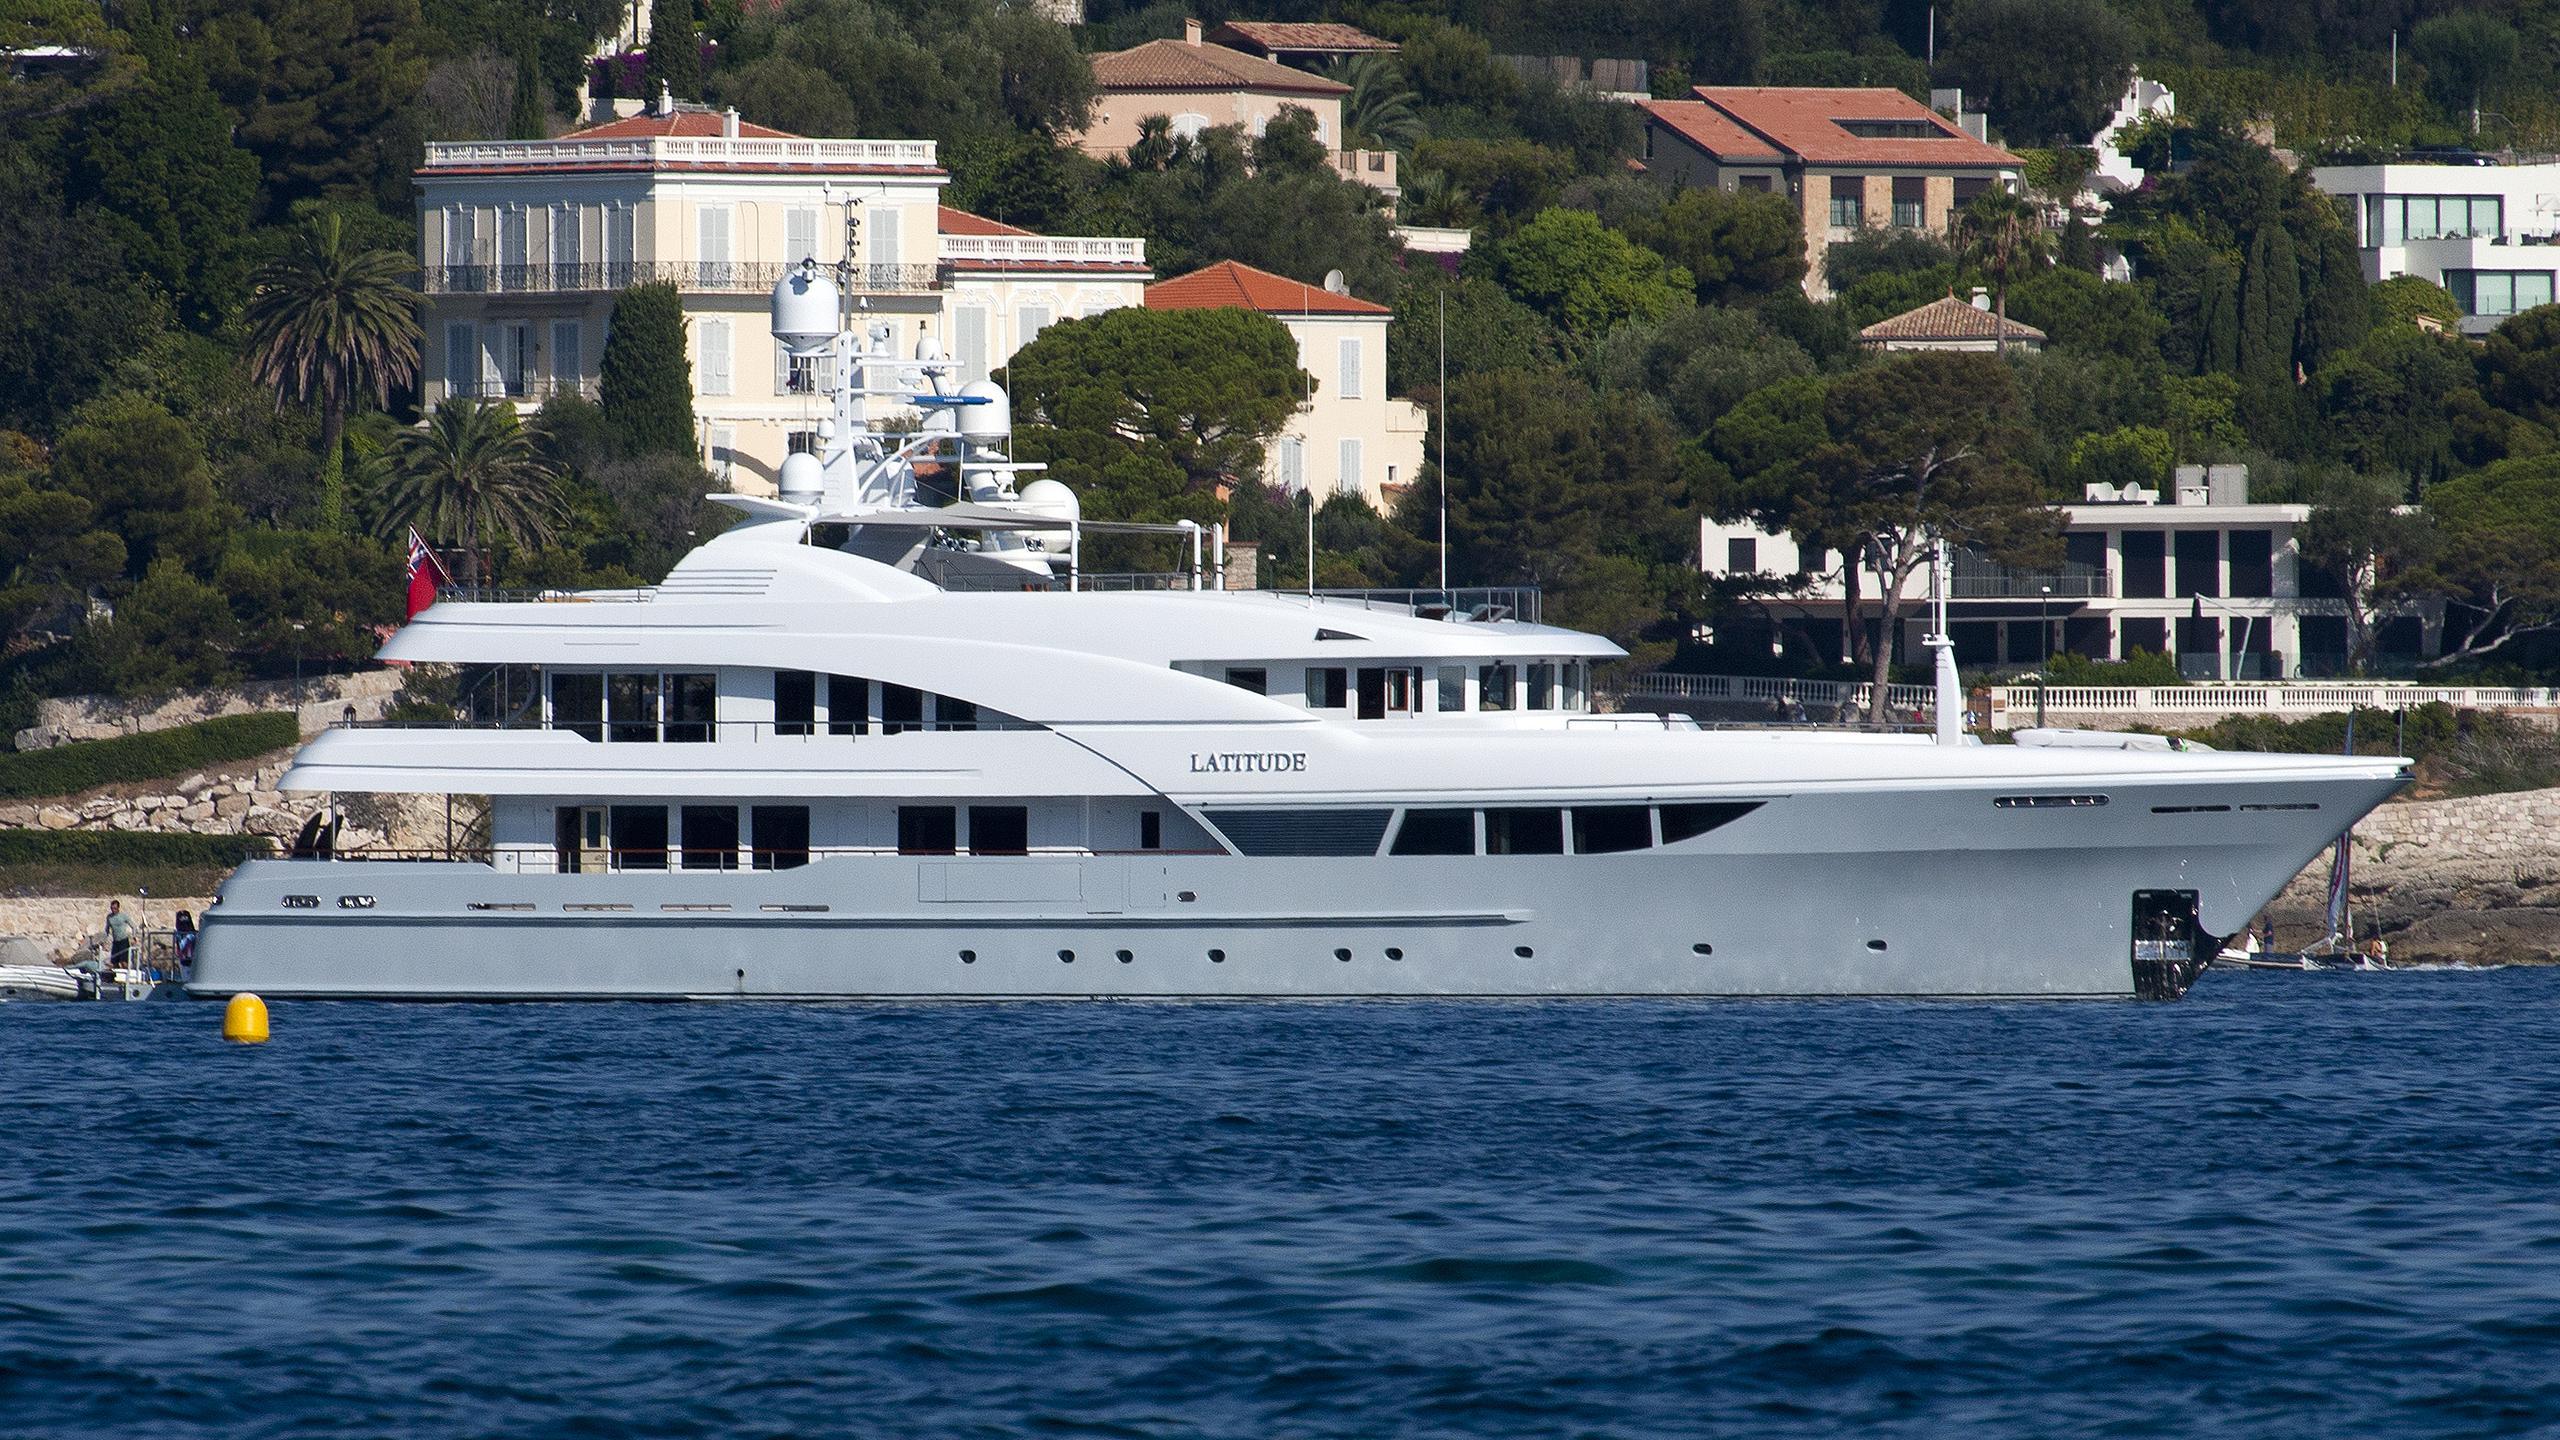 latitude-yacht-exterior